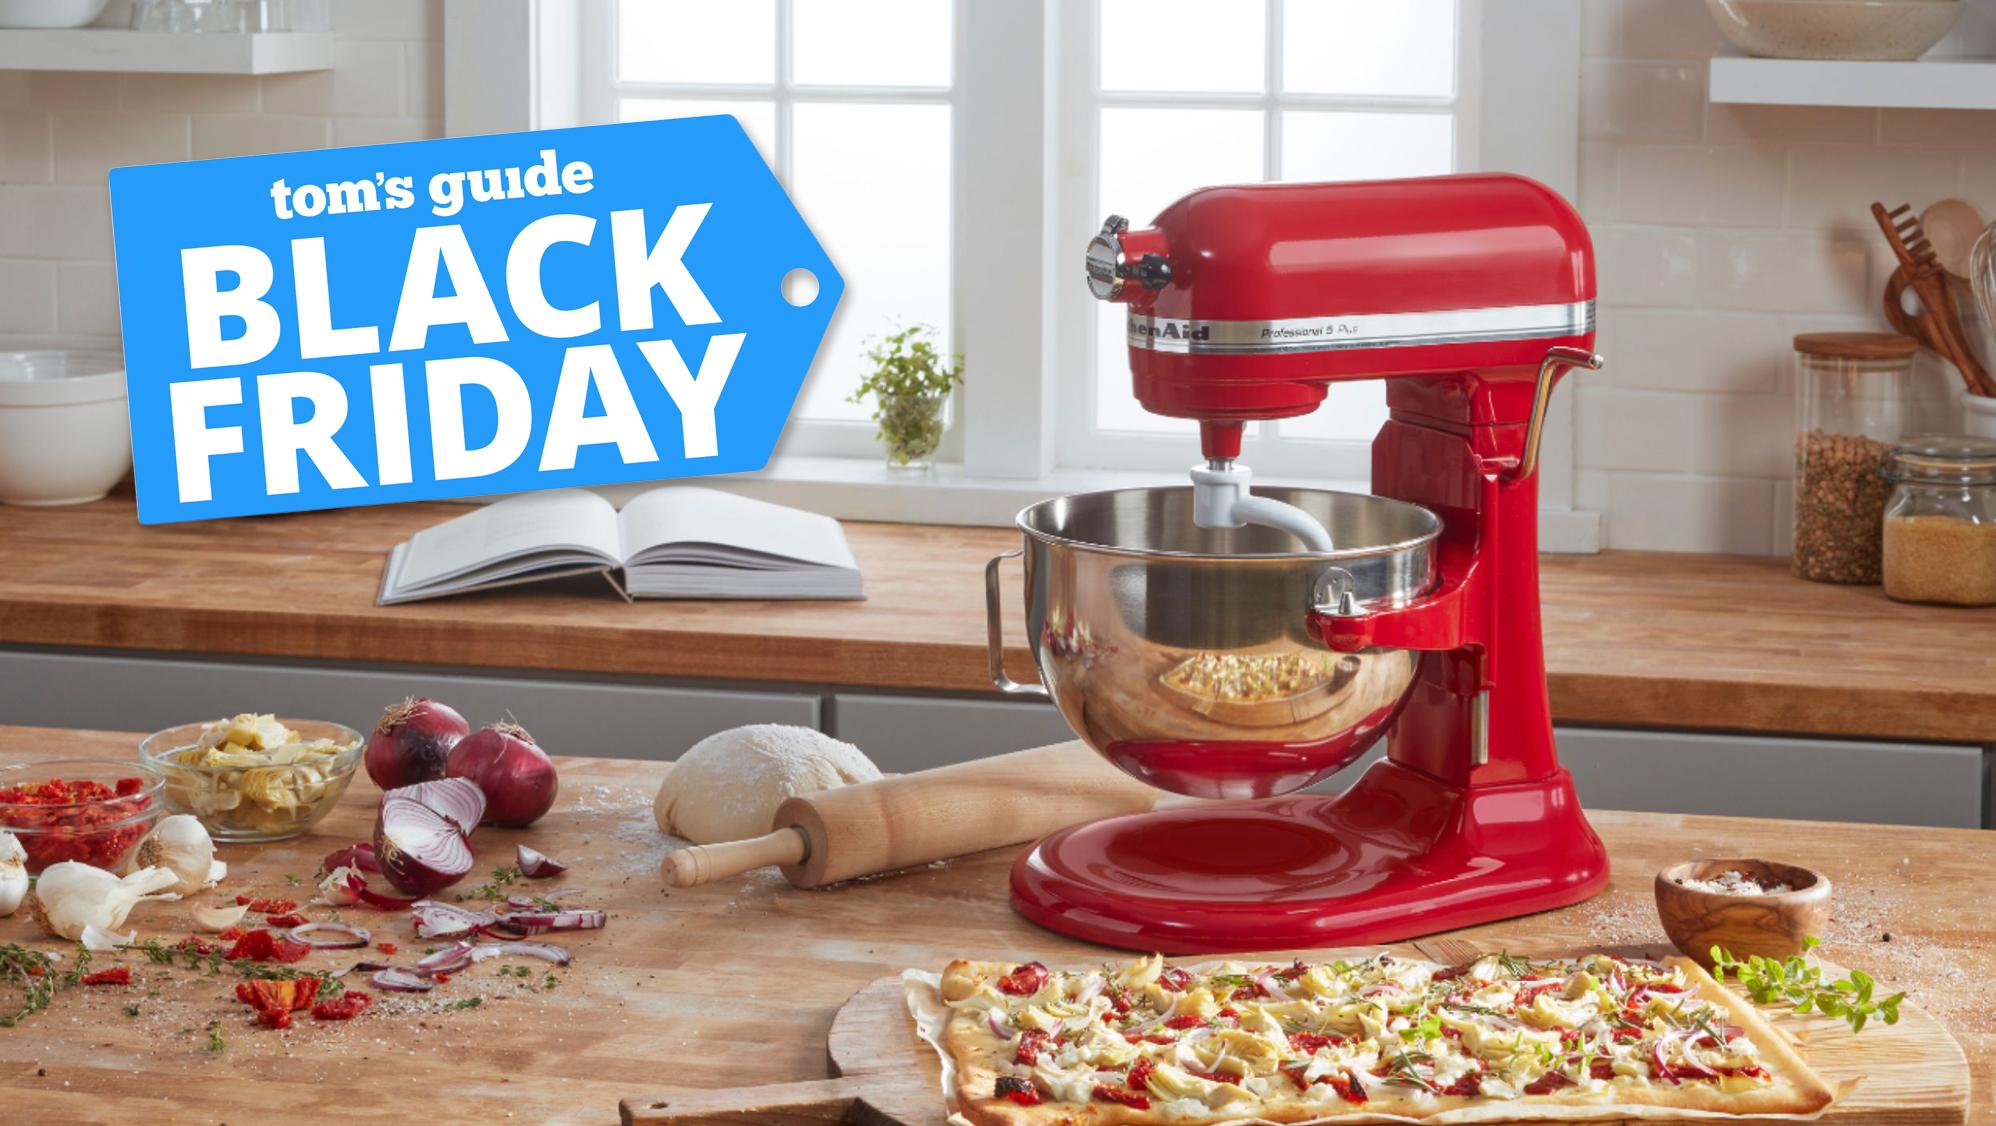 Best Black Friday Kitchen Appliance Deals 2020 Tom S Guide